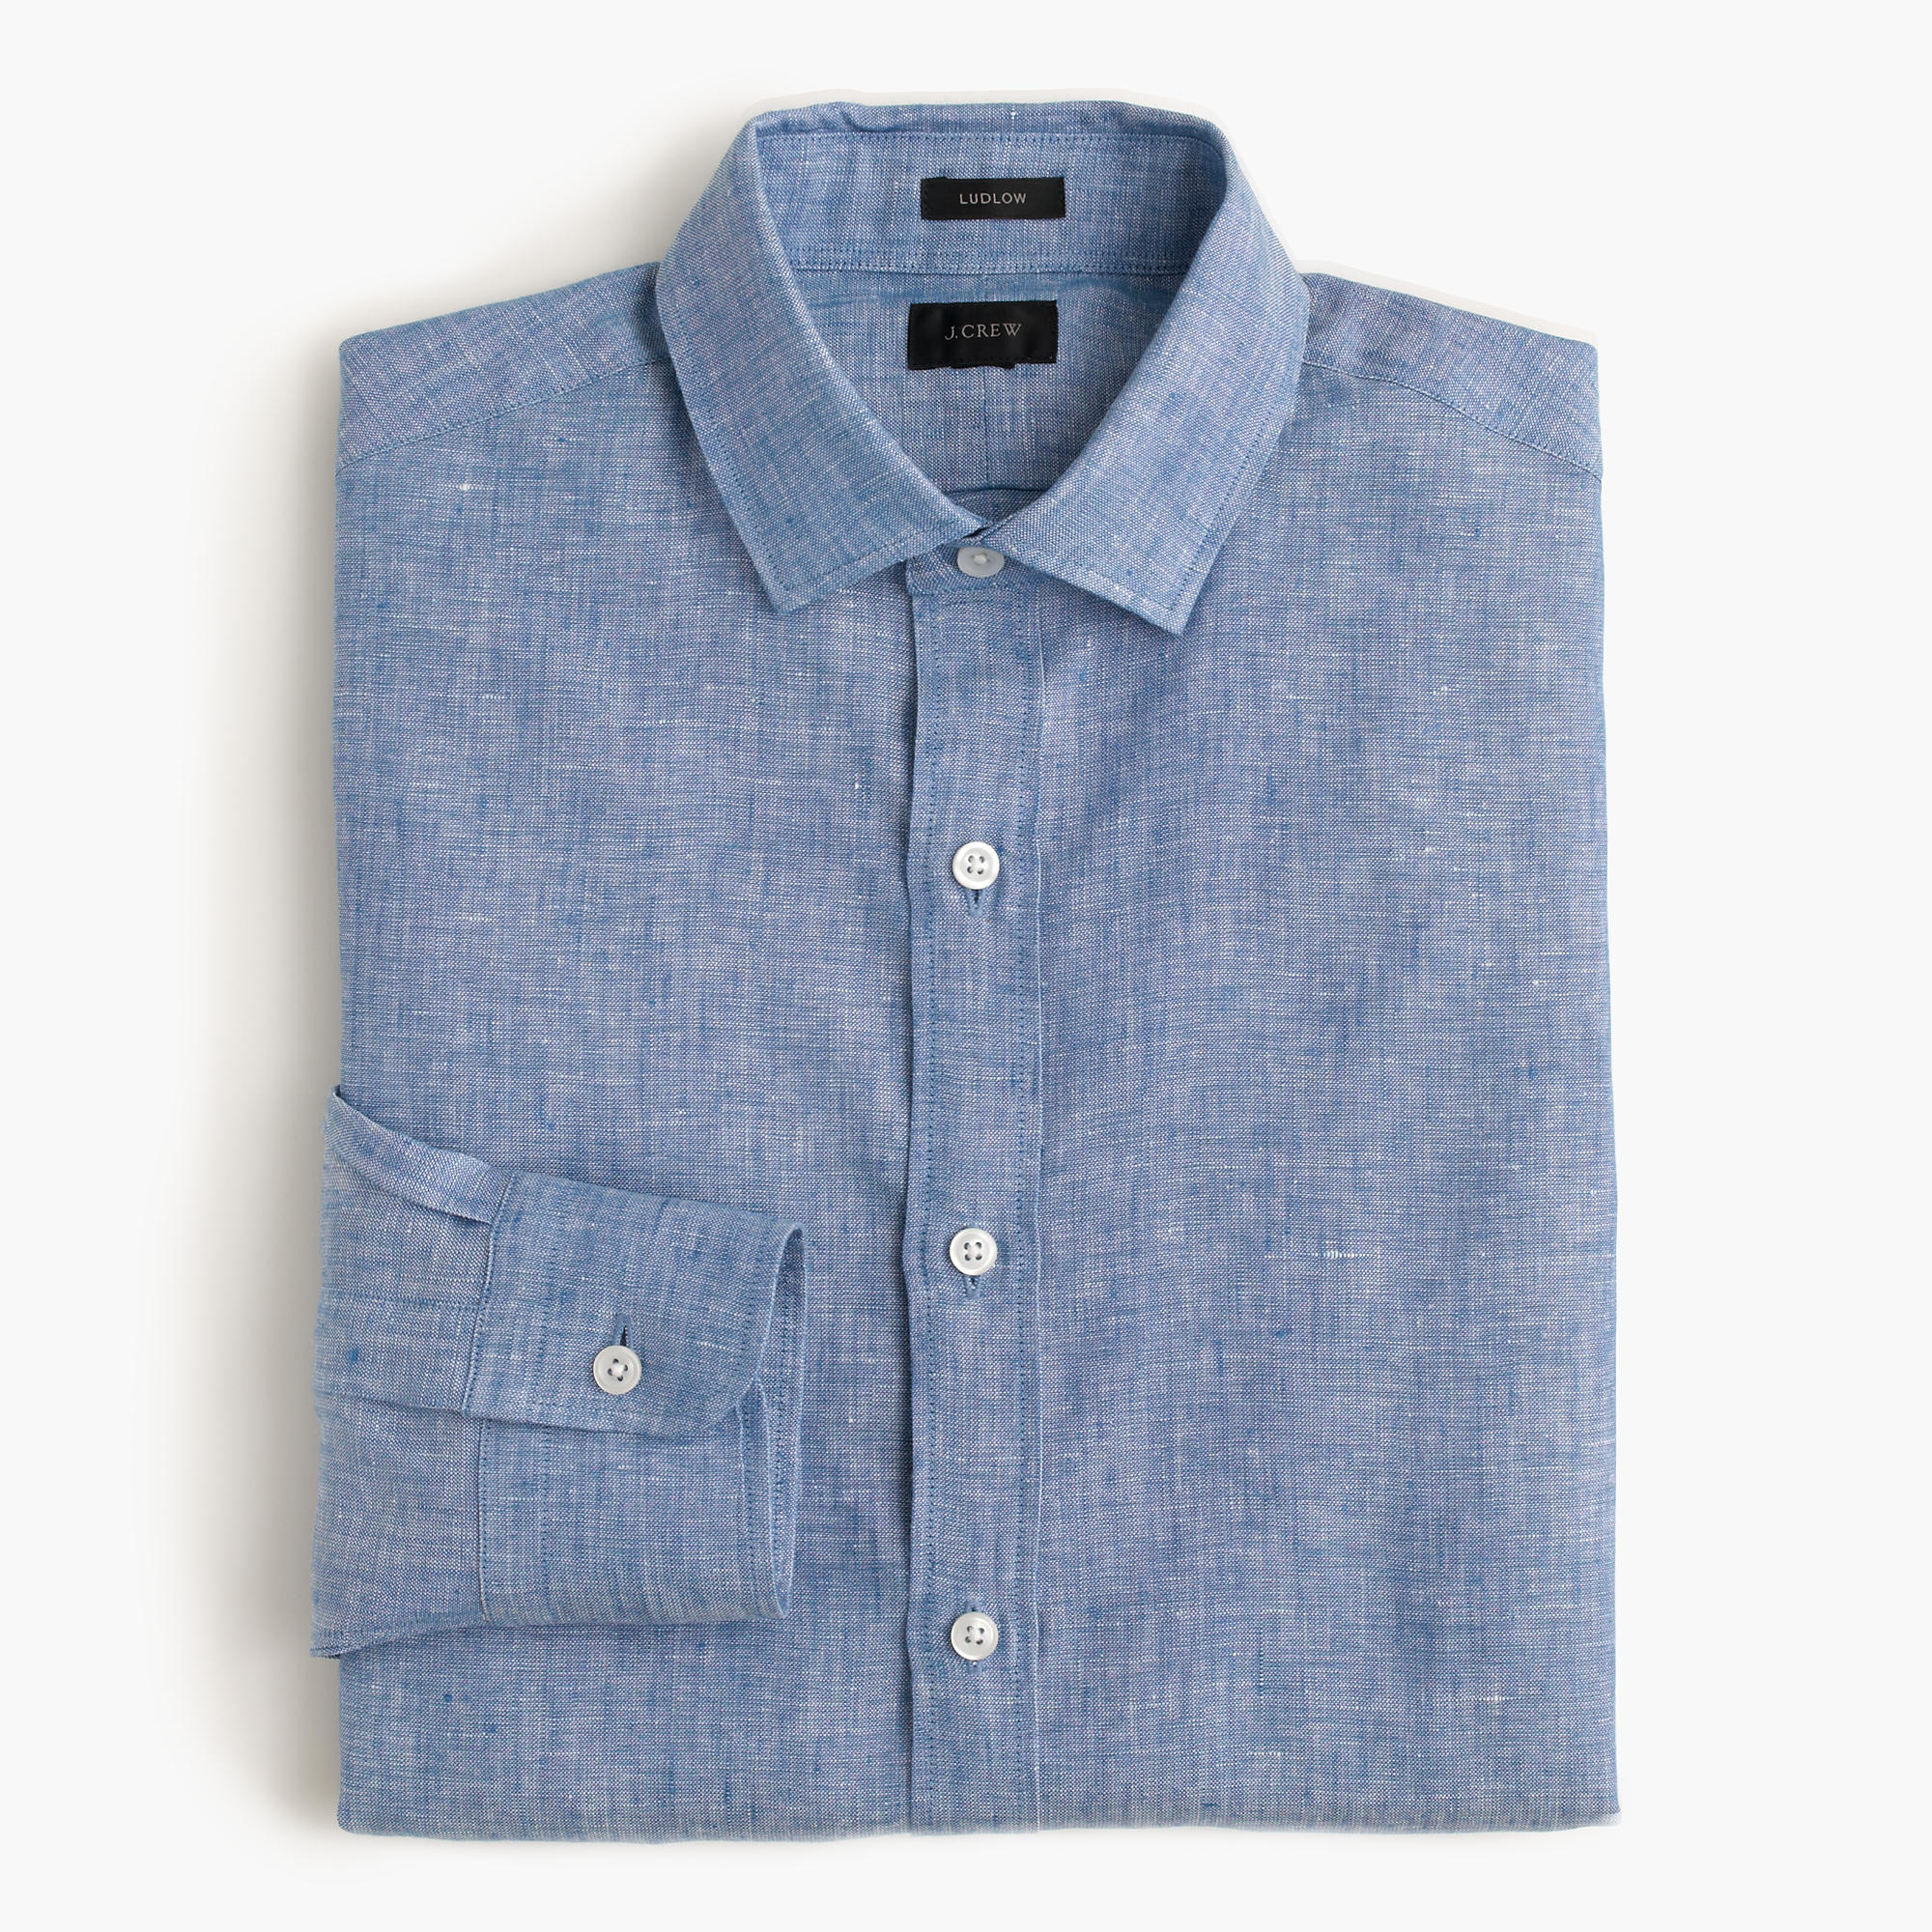 Ludlow shirt in d lav irish linen men 39 s shirts j crew for Irish linen dress shirts